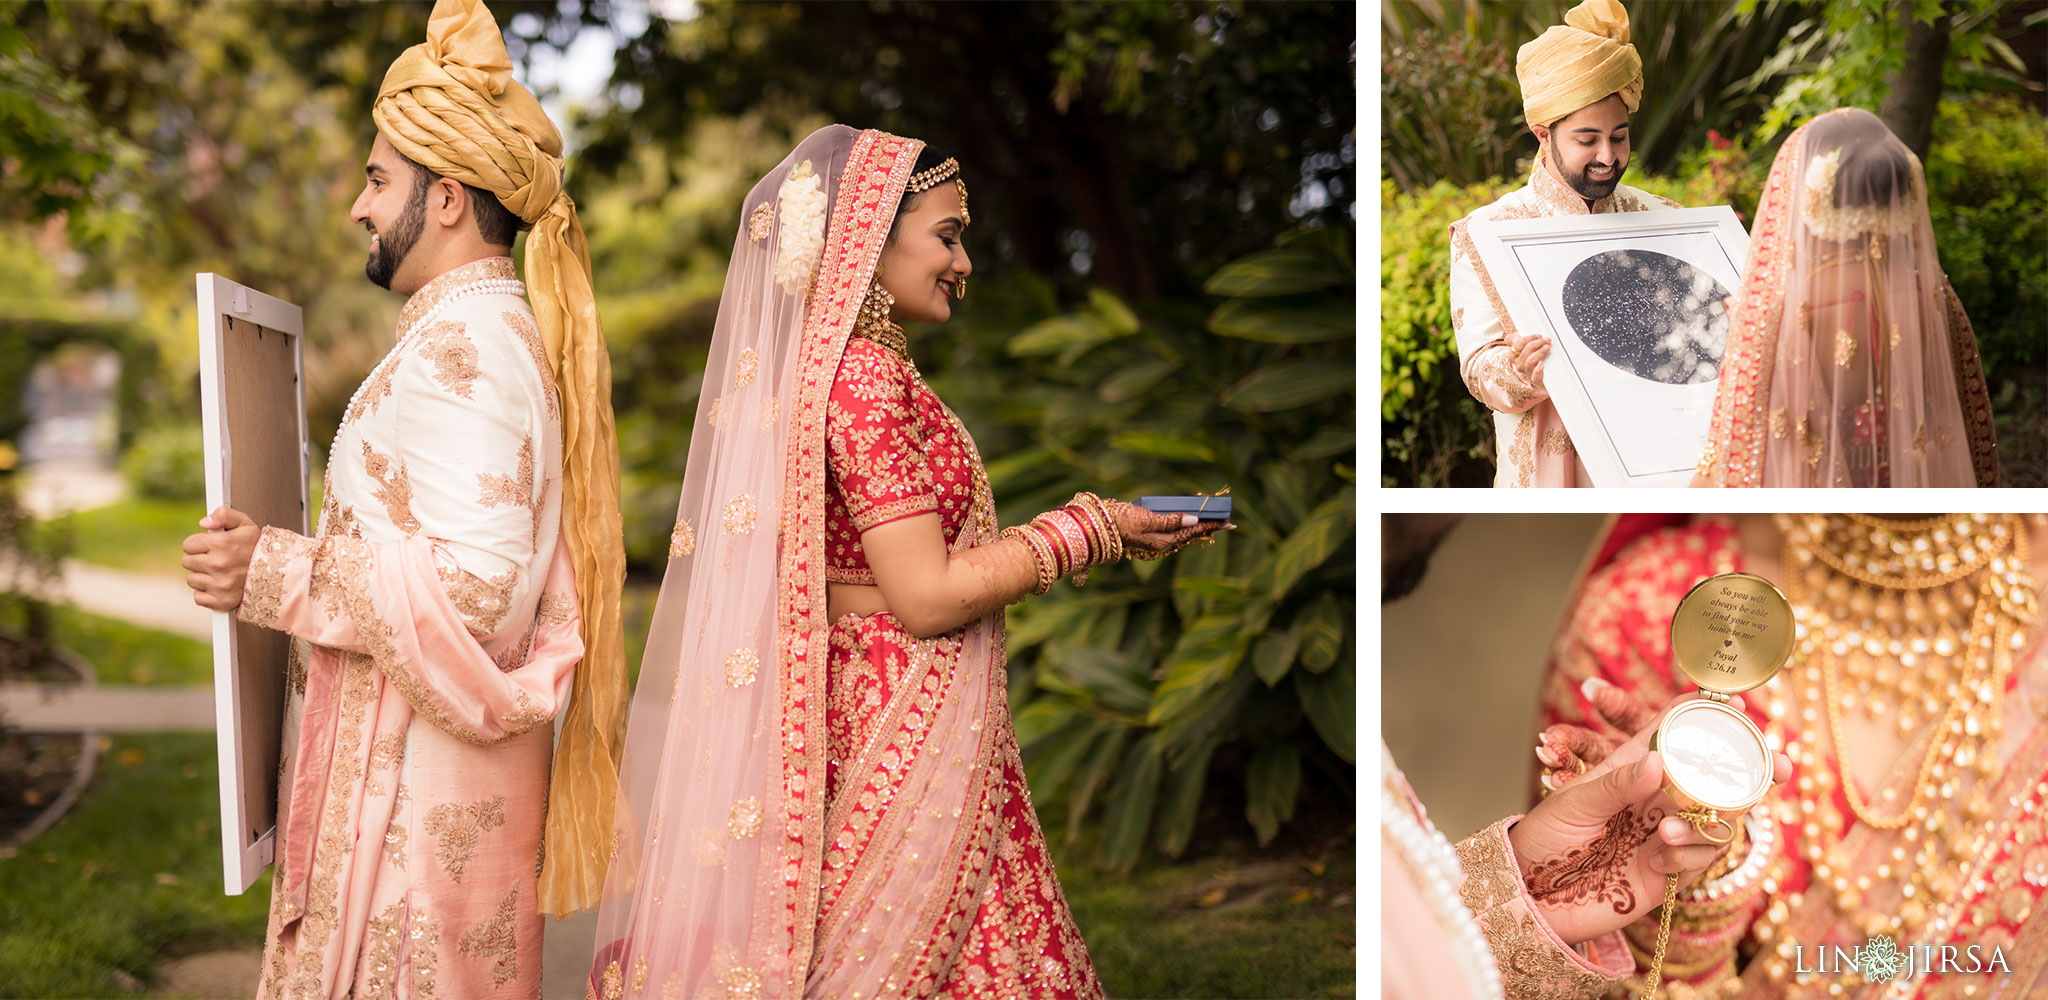 17 four seasons westlake village indian wedding photography